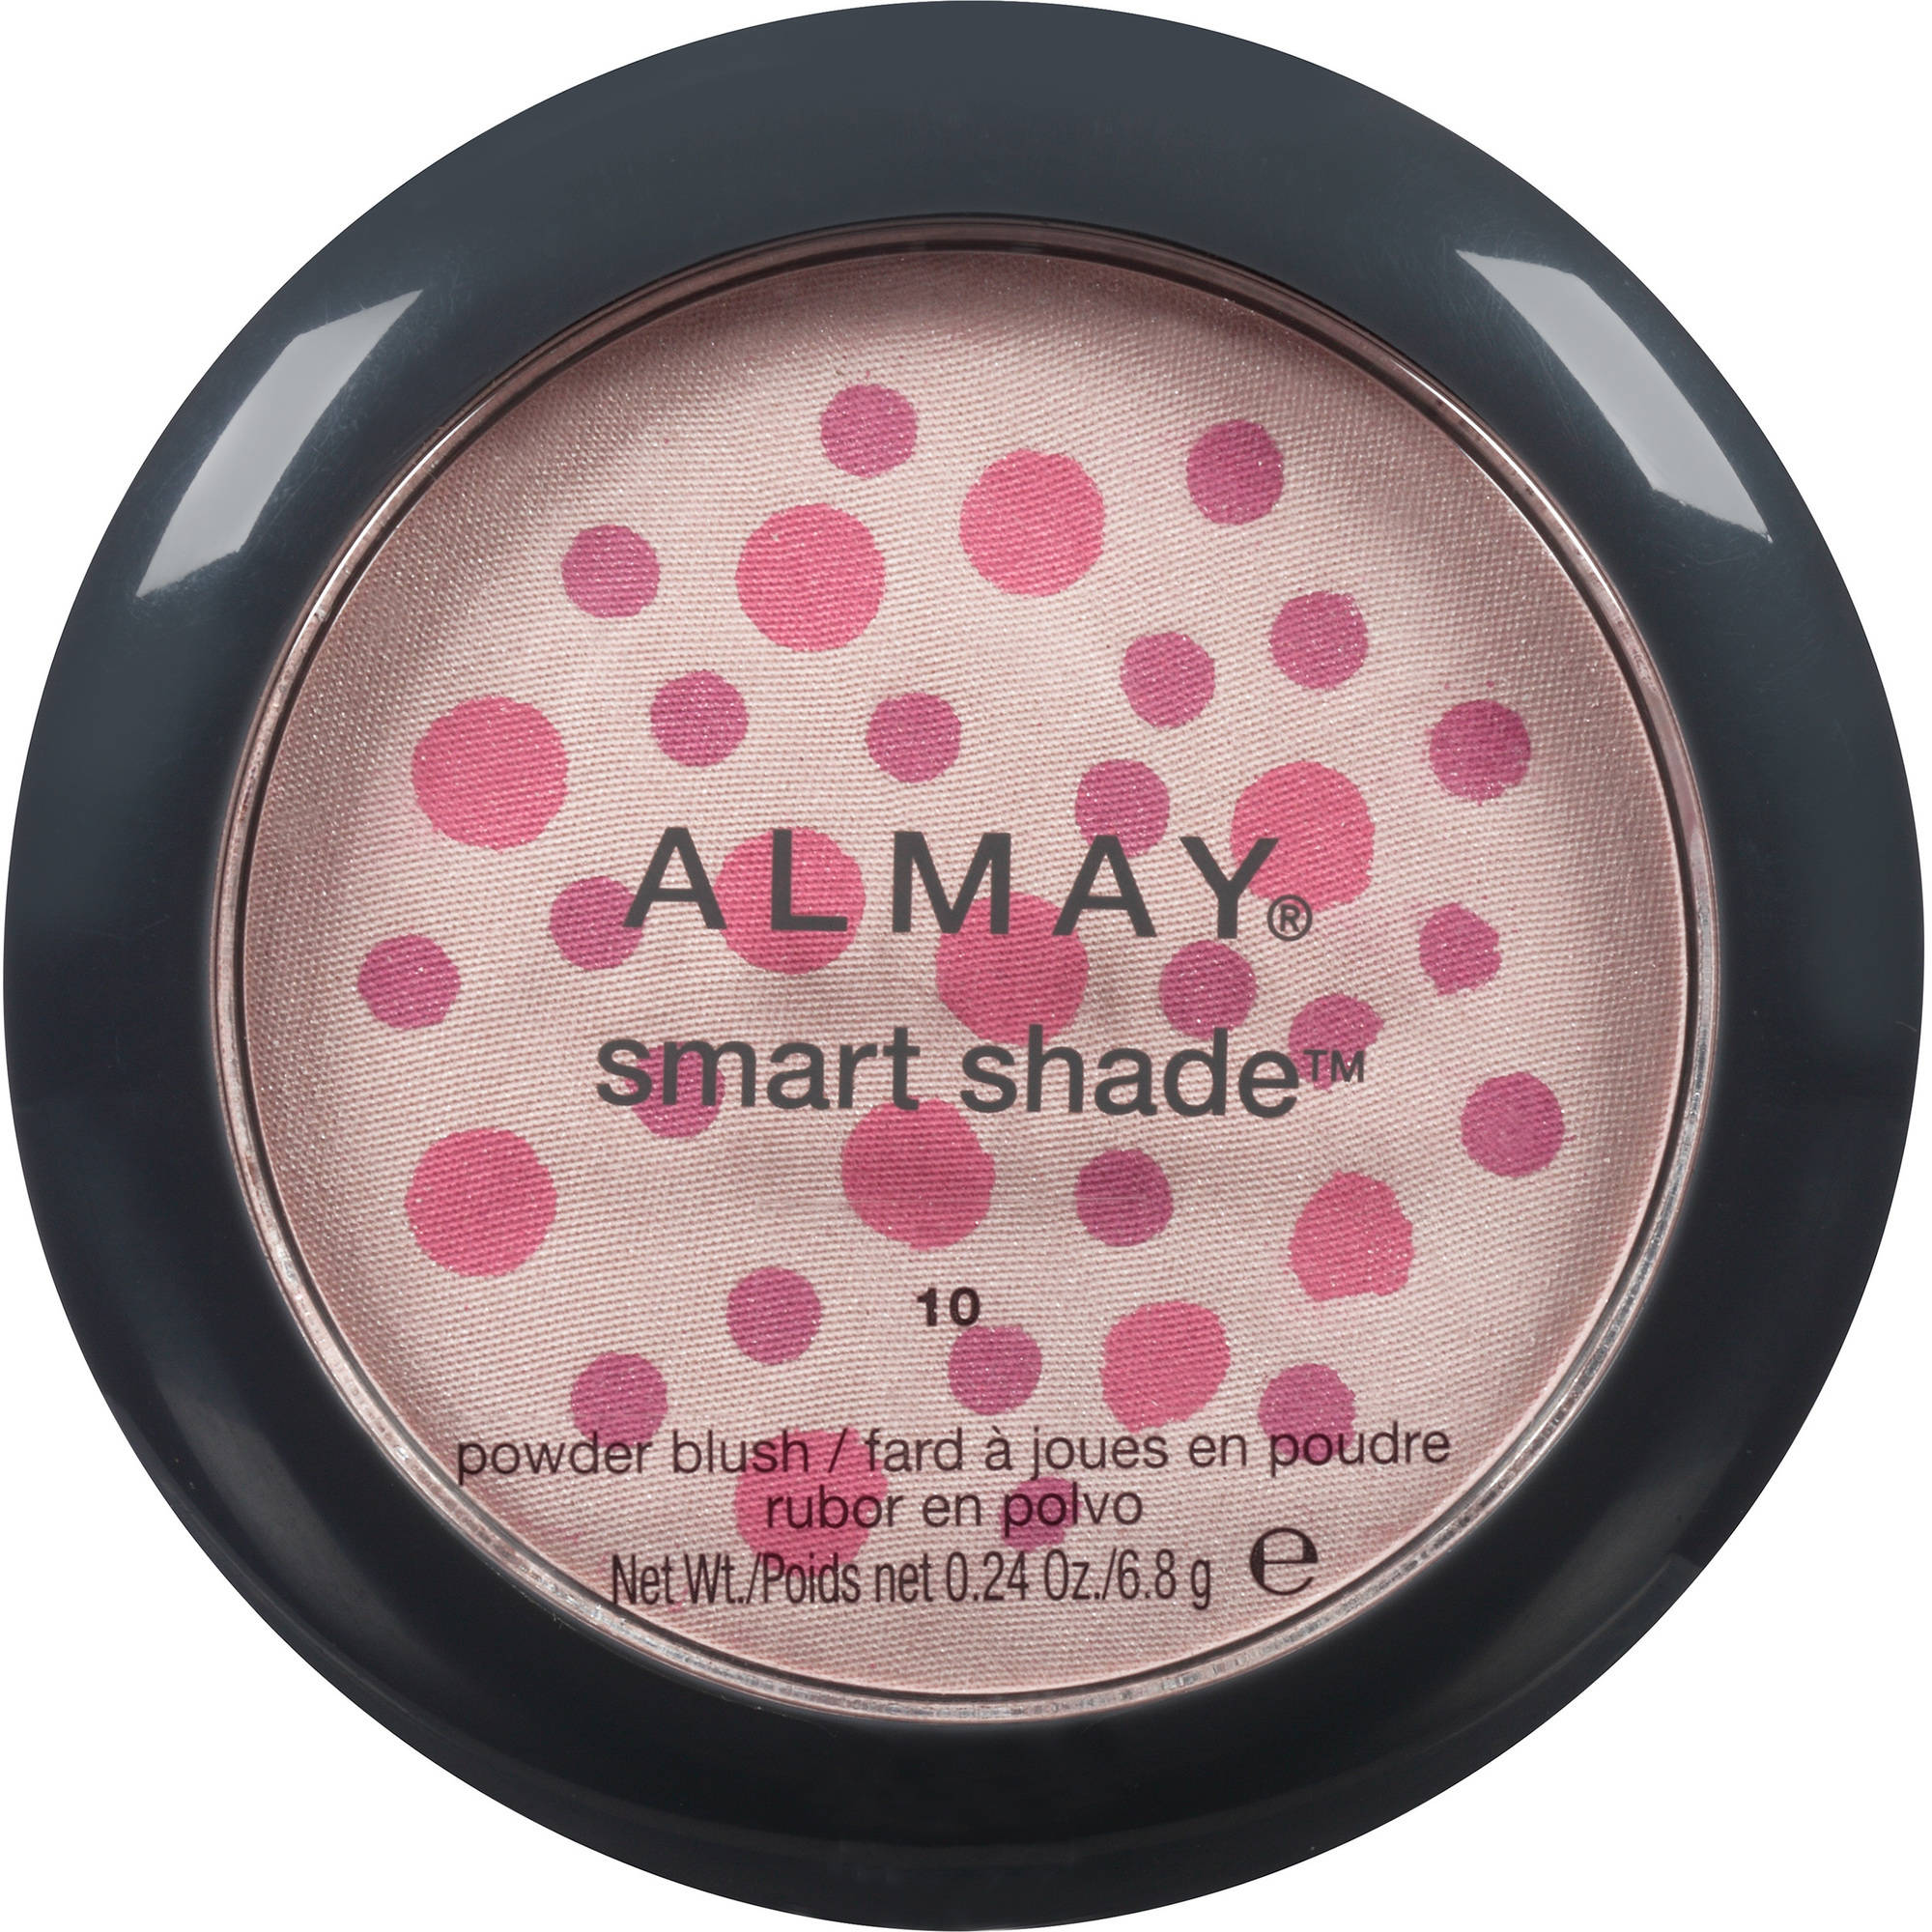 Almay Smart Shade Powder Blush, 10 Pink/Rose, 0.24 oz